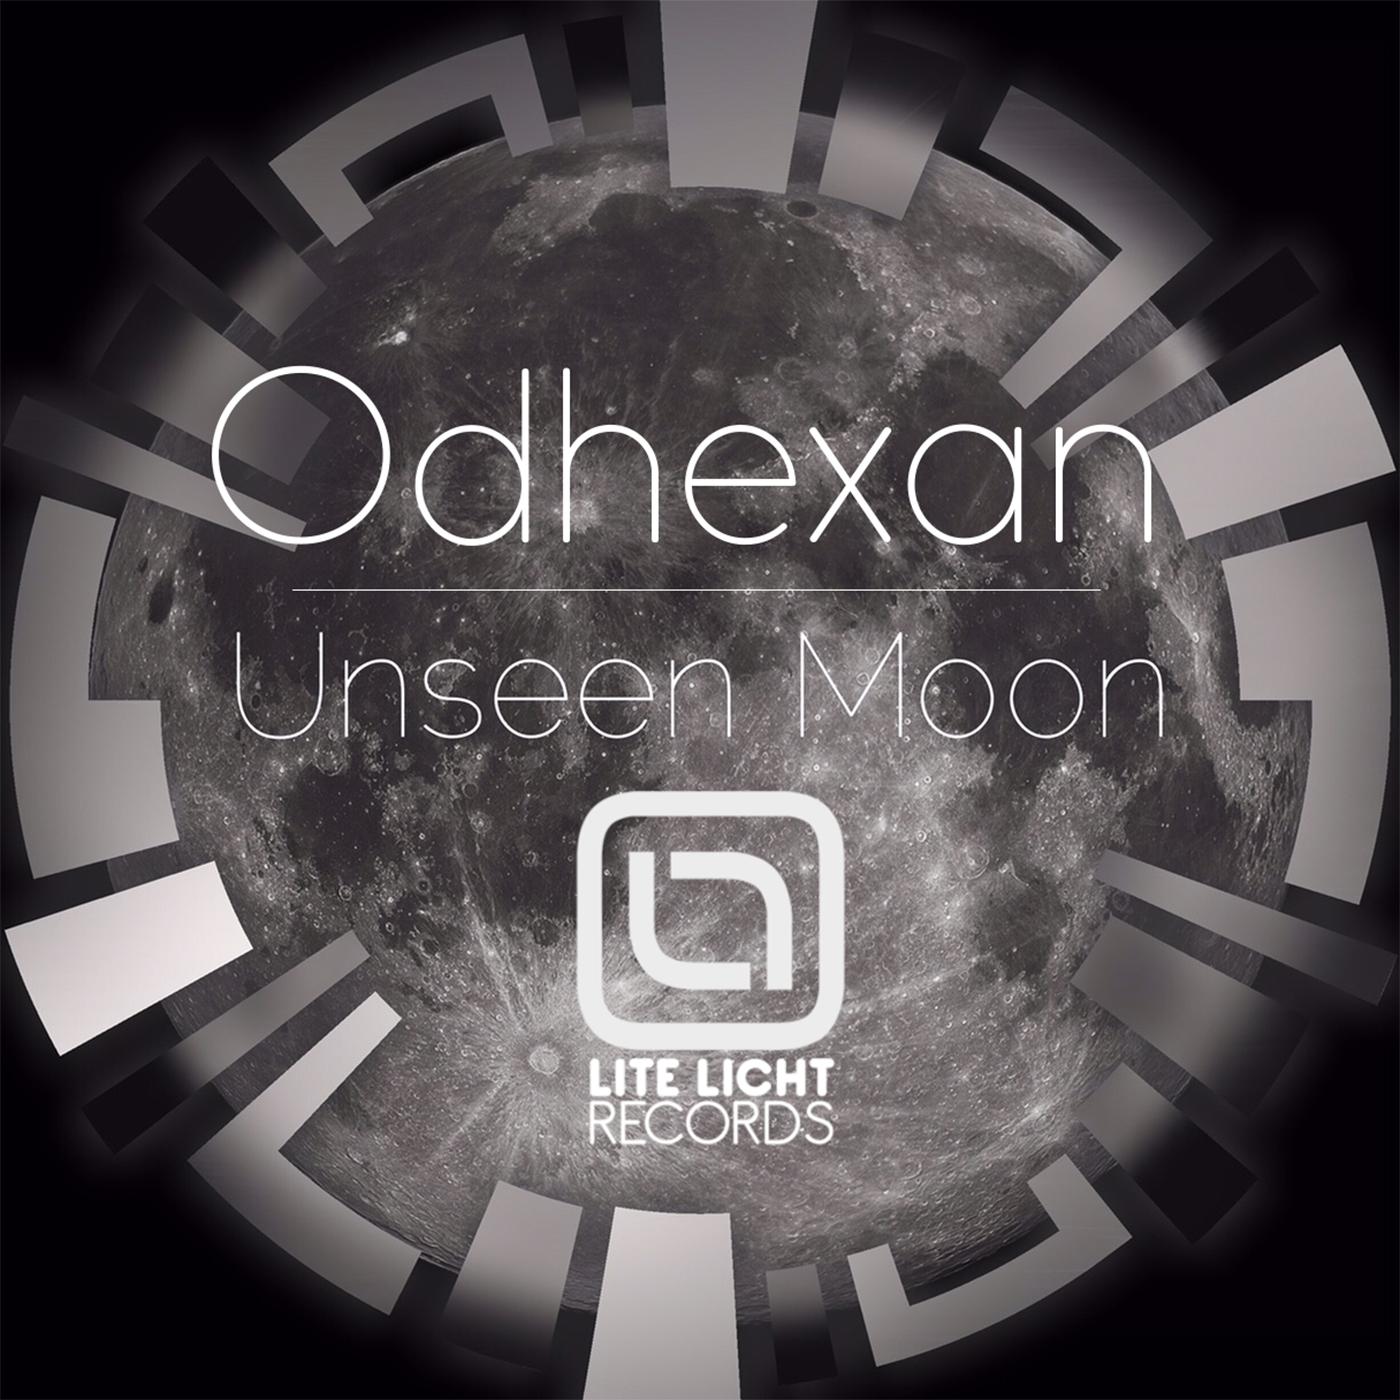 Unseen Moon Odhexan